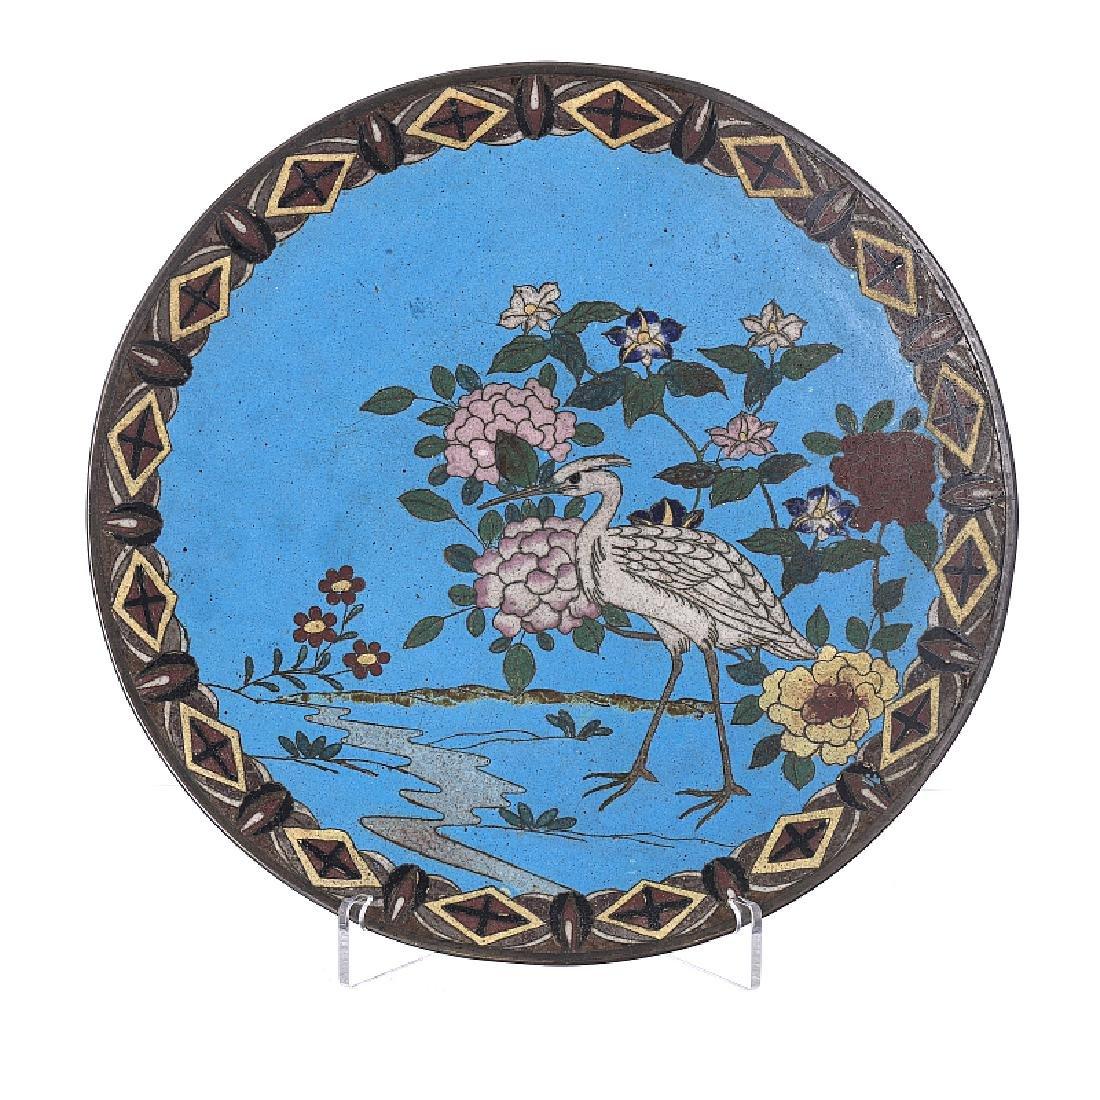 Cloisonne metal plate